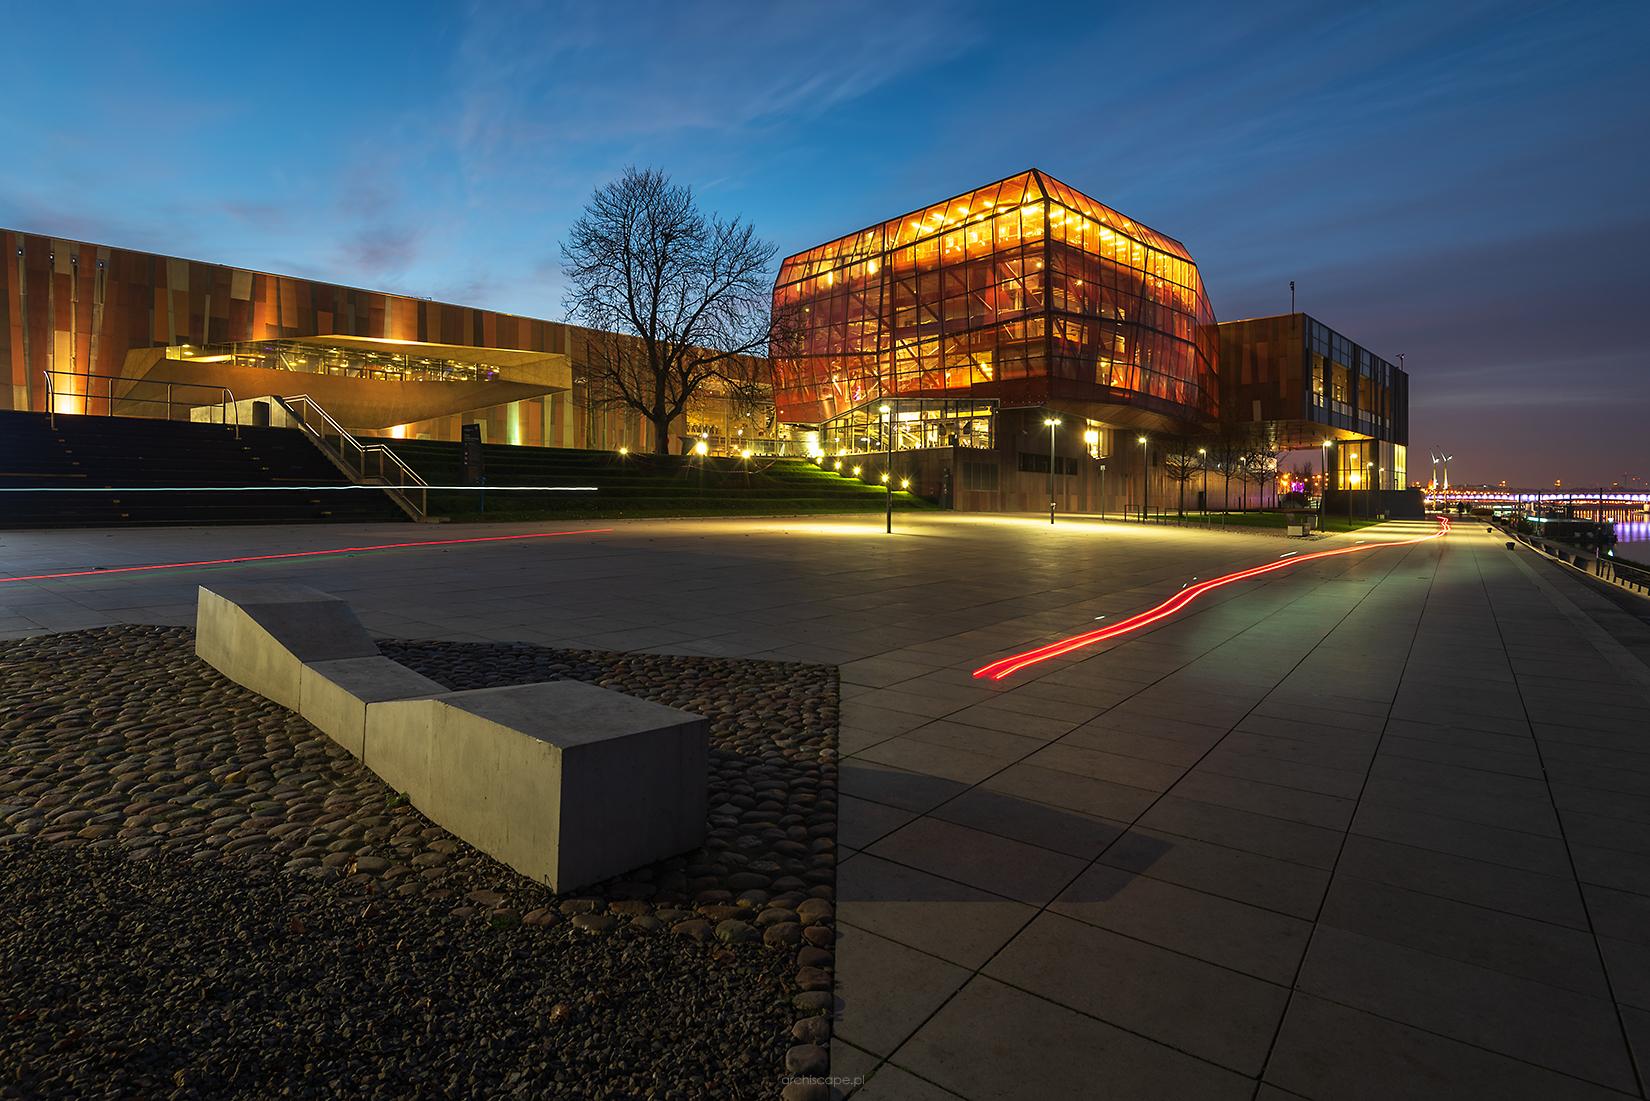 Copernicus Science Centre, Poland